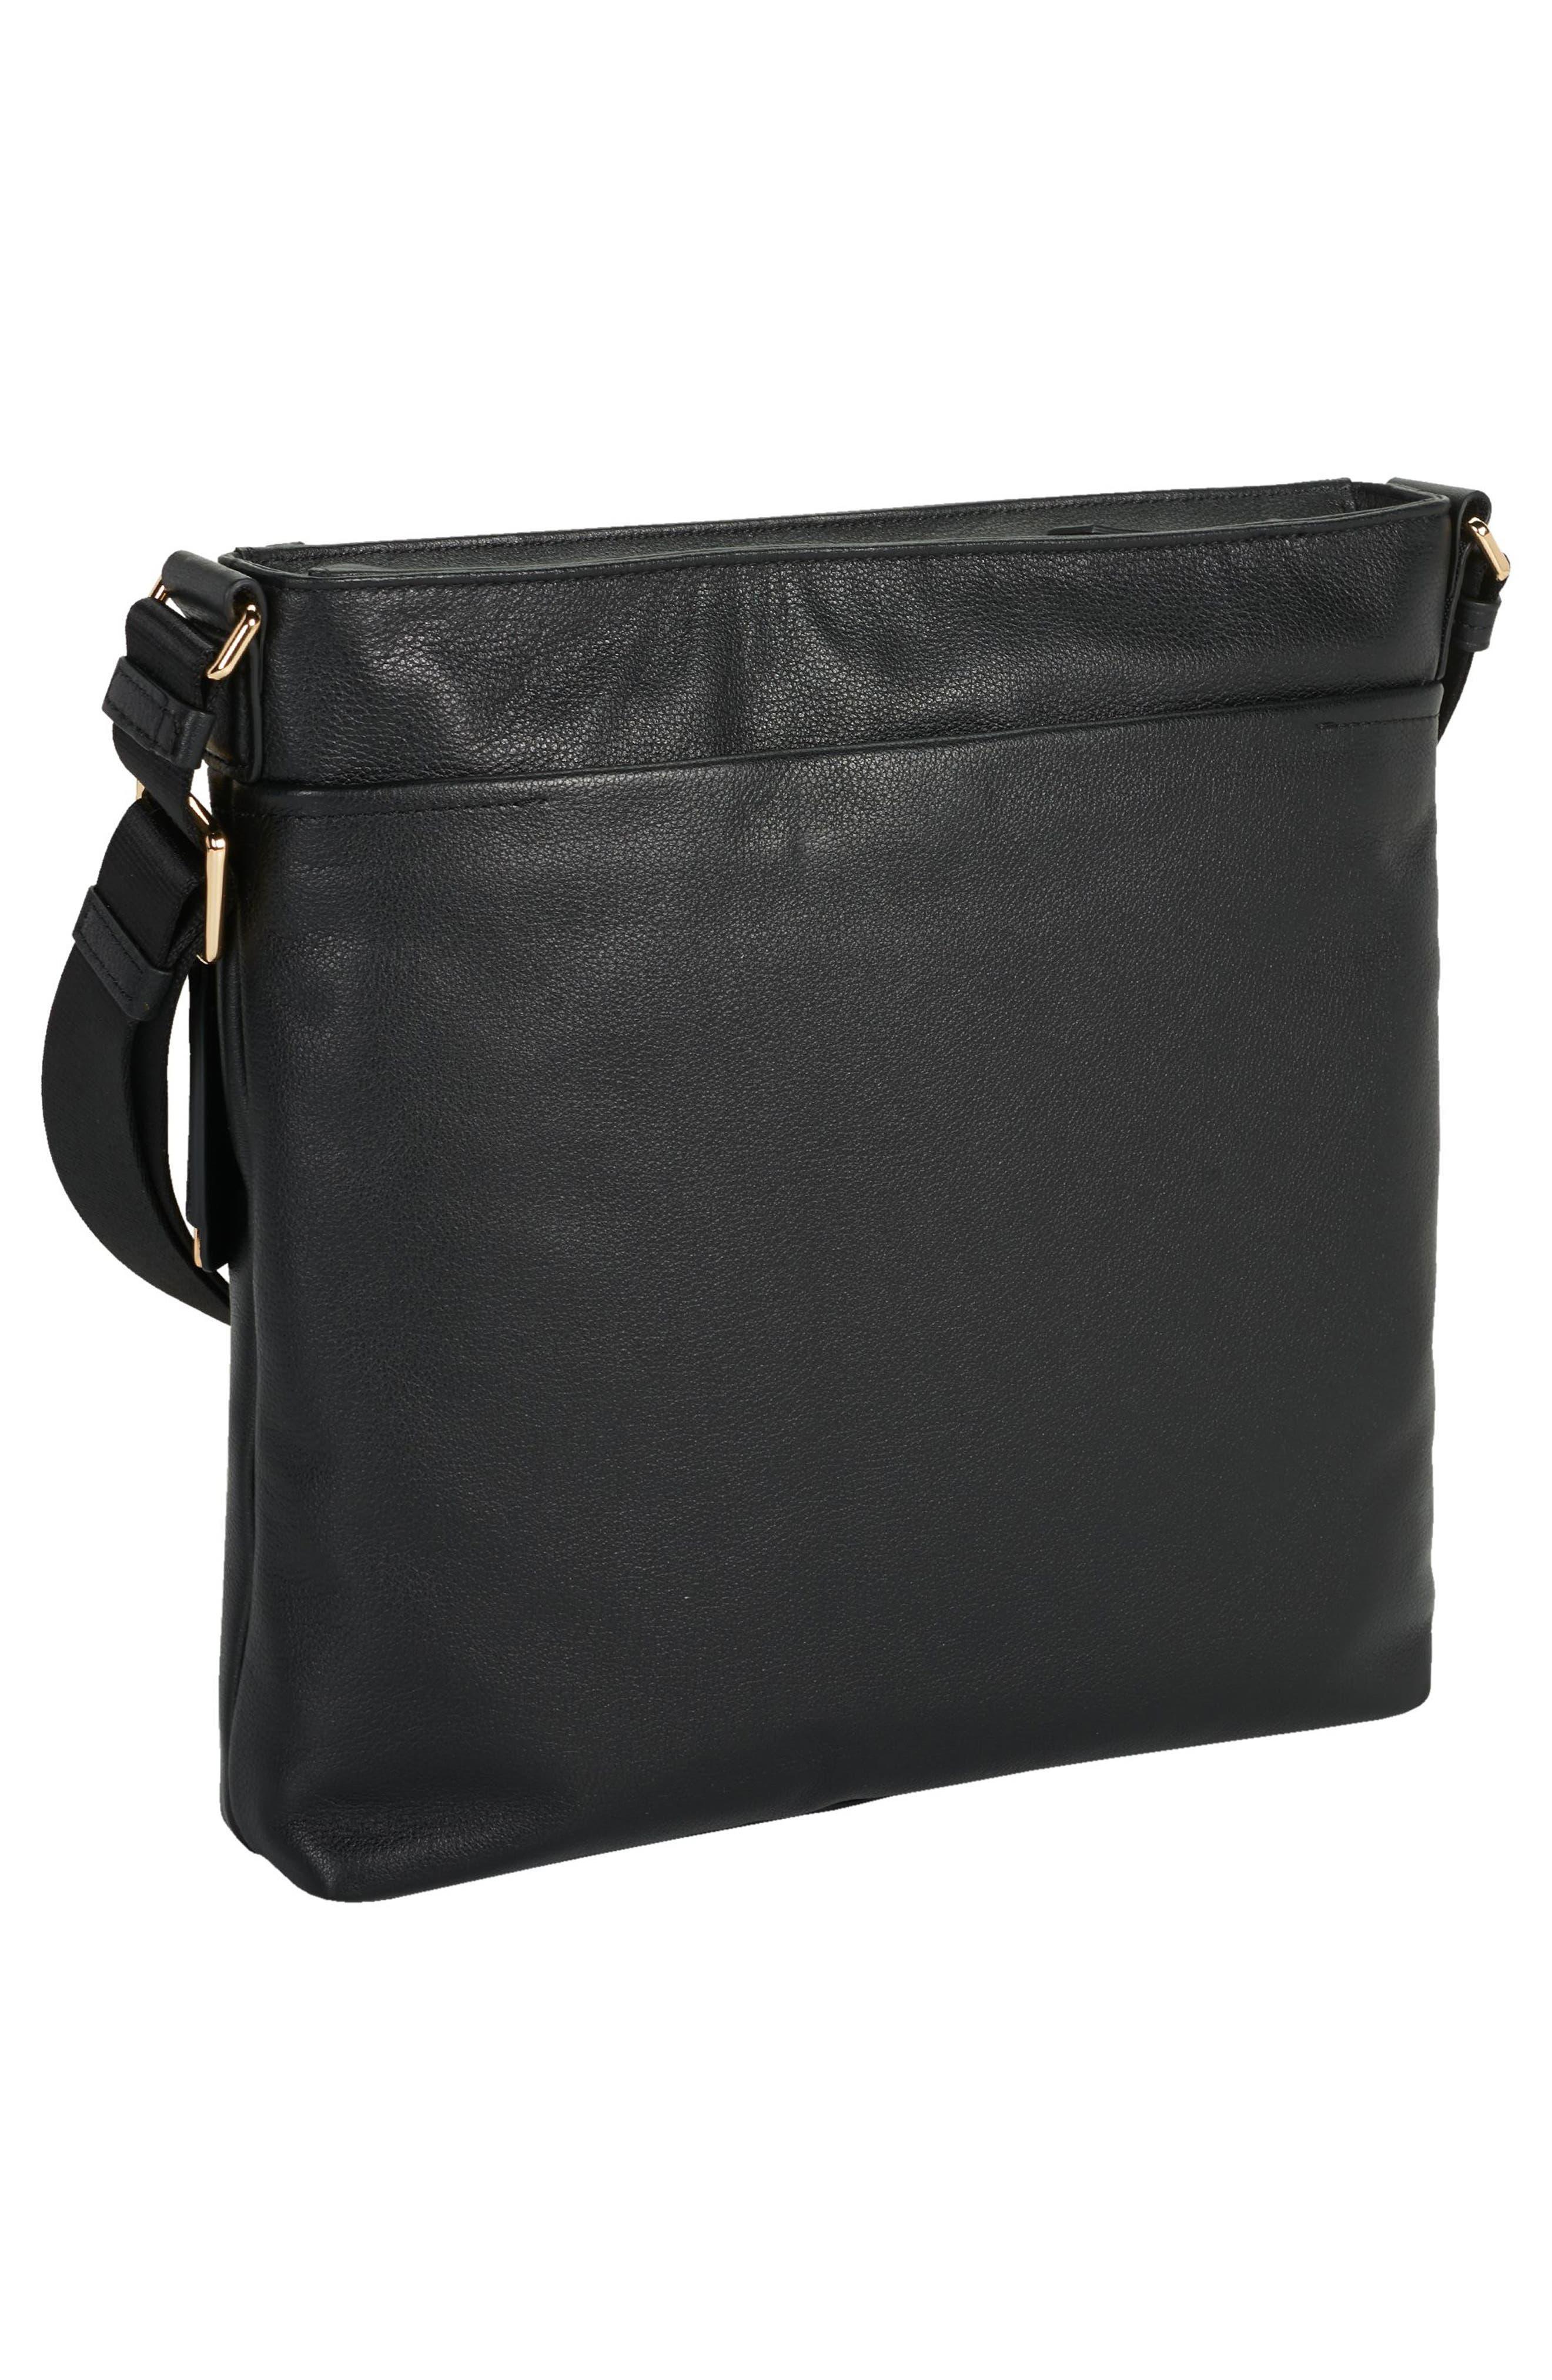 Voyageur - Capri Leather Crossbody Bag,                             Alternate thumbnail 8, color,